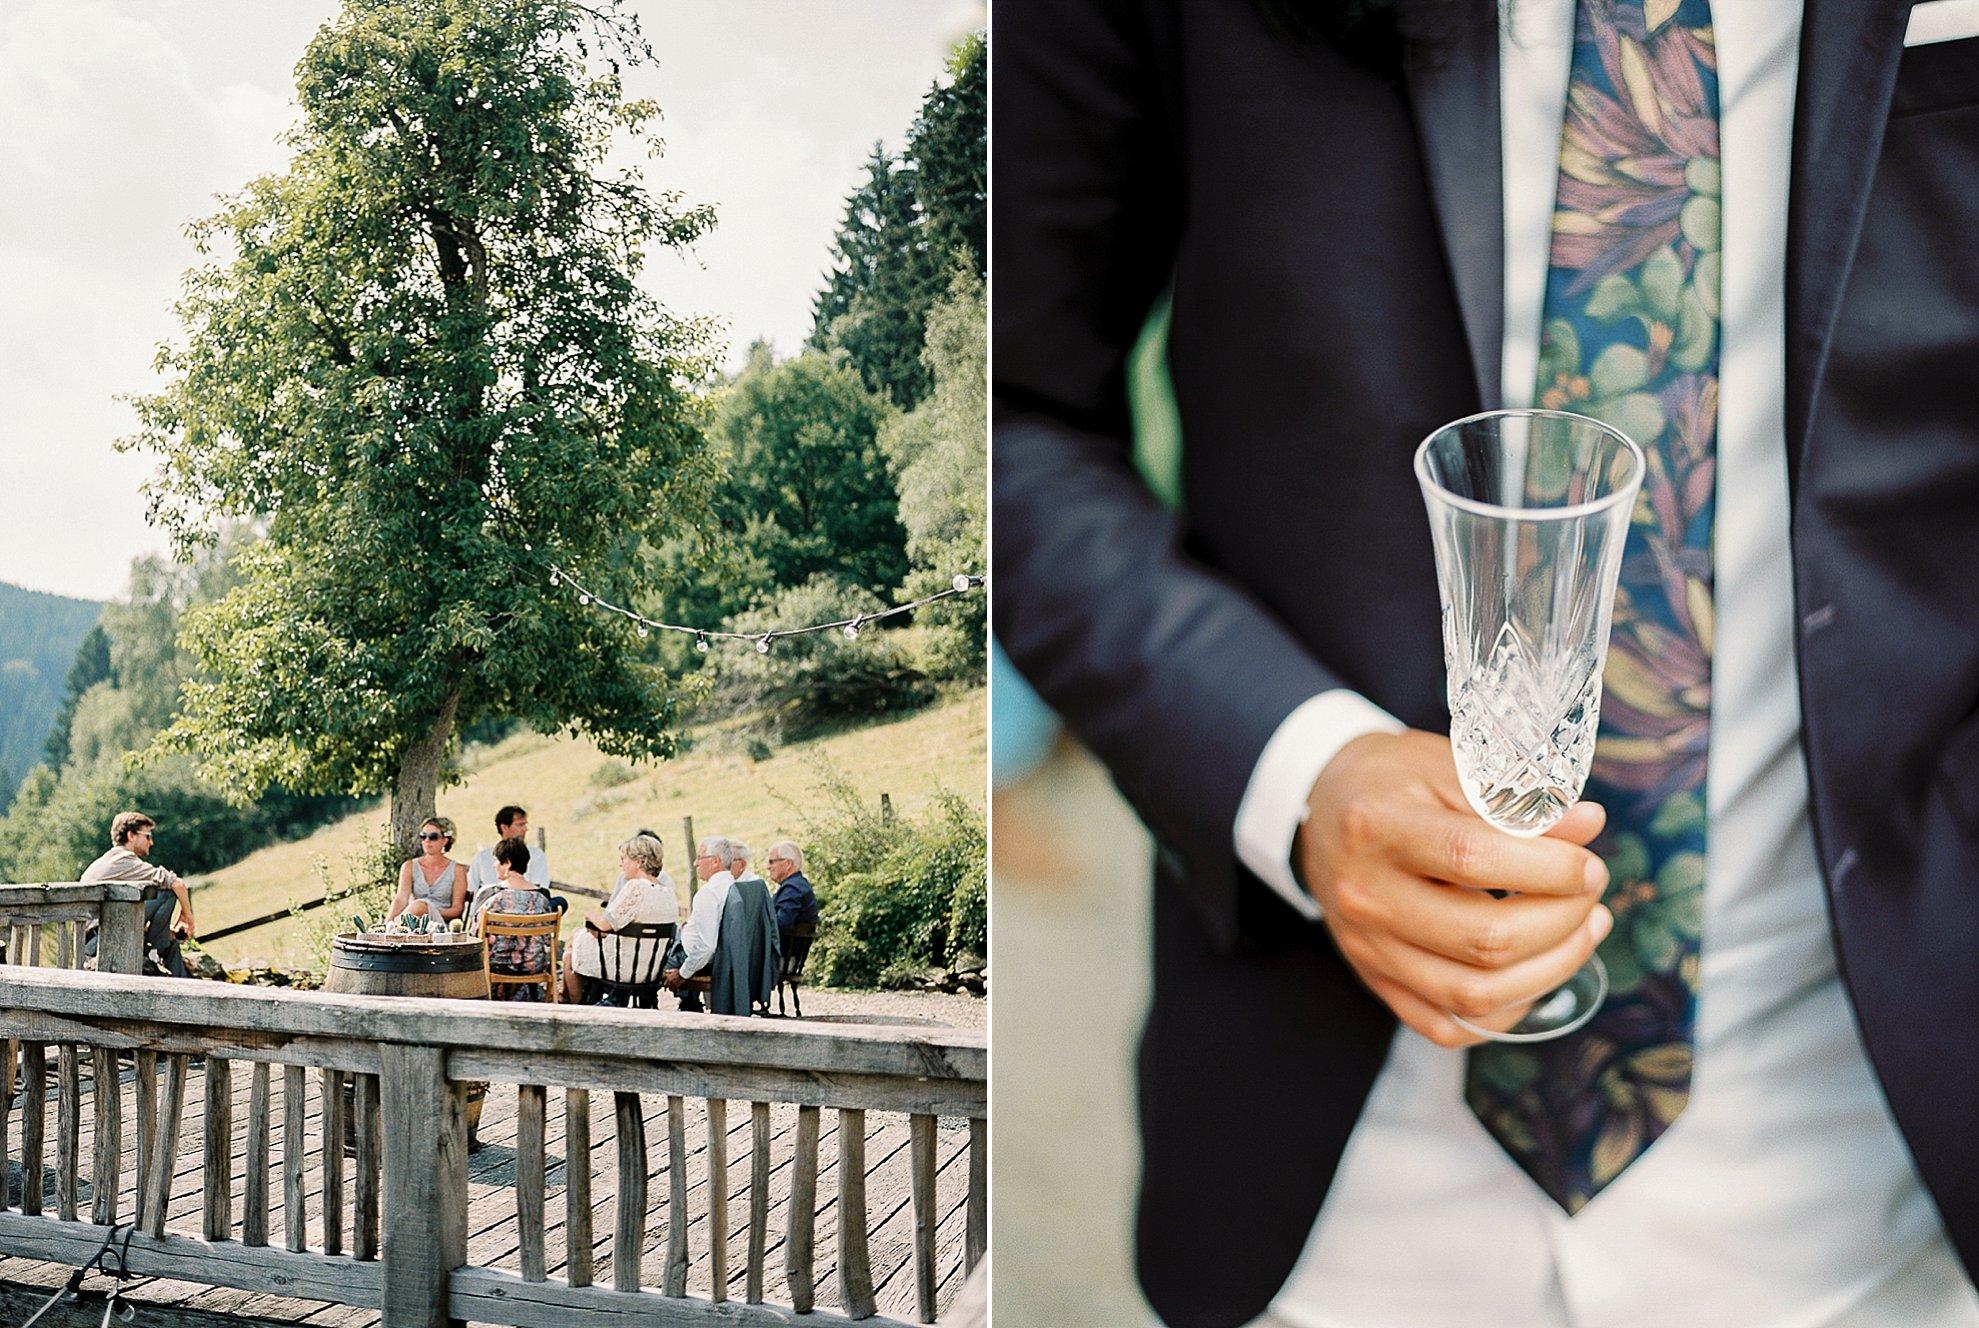 Amanda-Drost-Fotografie-Belgie-Photography-Wedding_0020.jpg